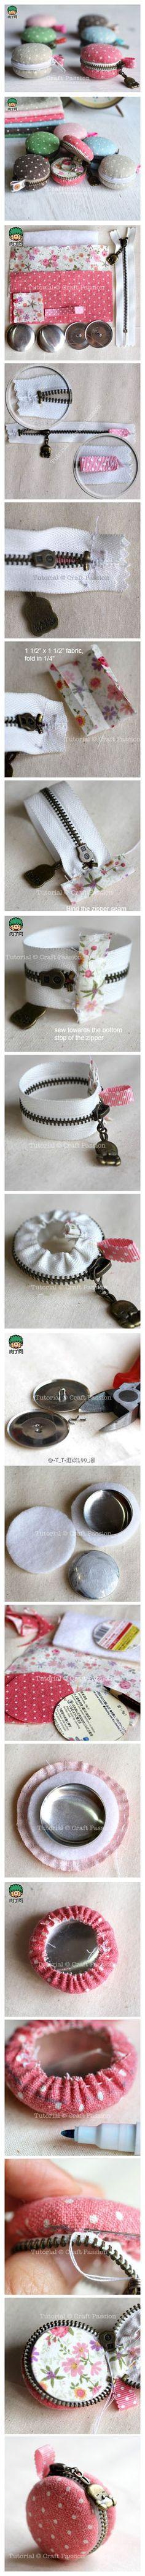 DIY 自制汉堡型的包包 (version porte monnaie/porte épingles - support carton+ouatine)